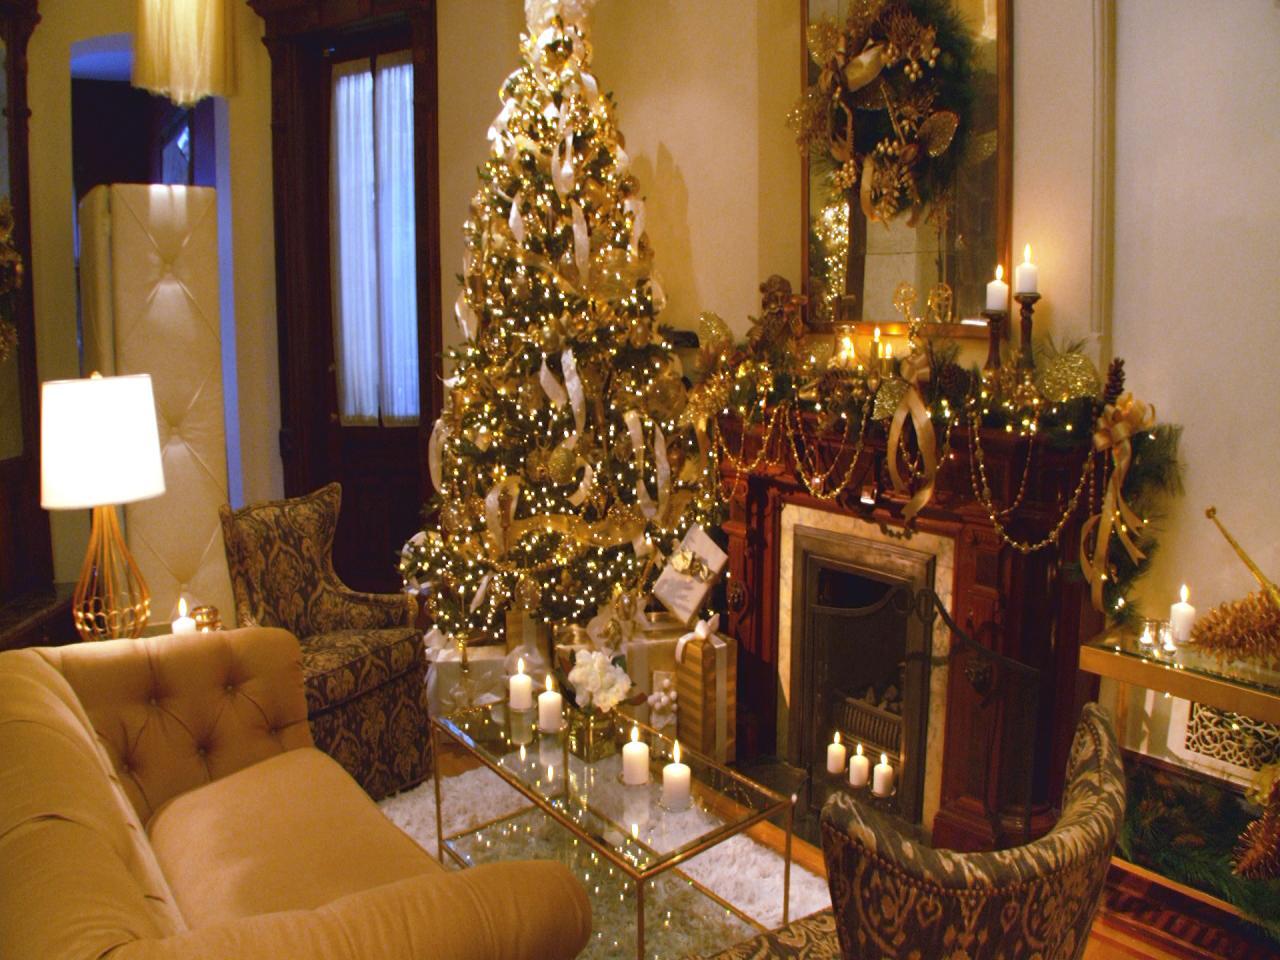 celebrity holiday decor interior design styles and color olday home decor artificial flowers piony 13 cabang ungu